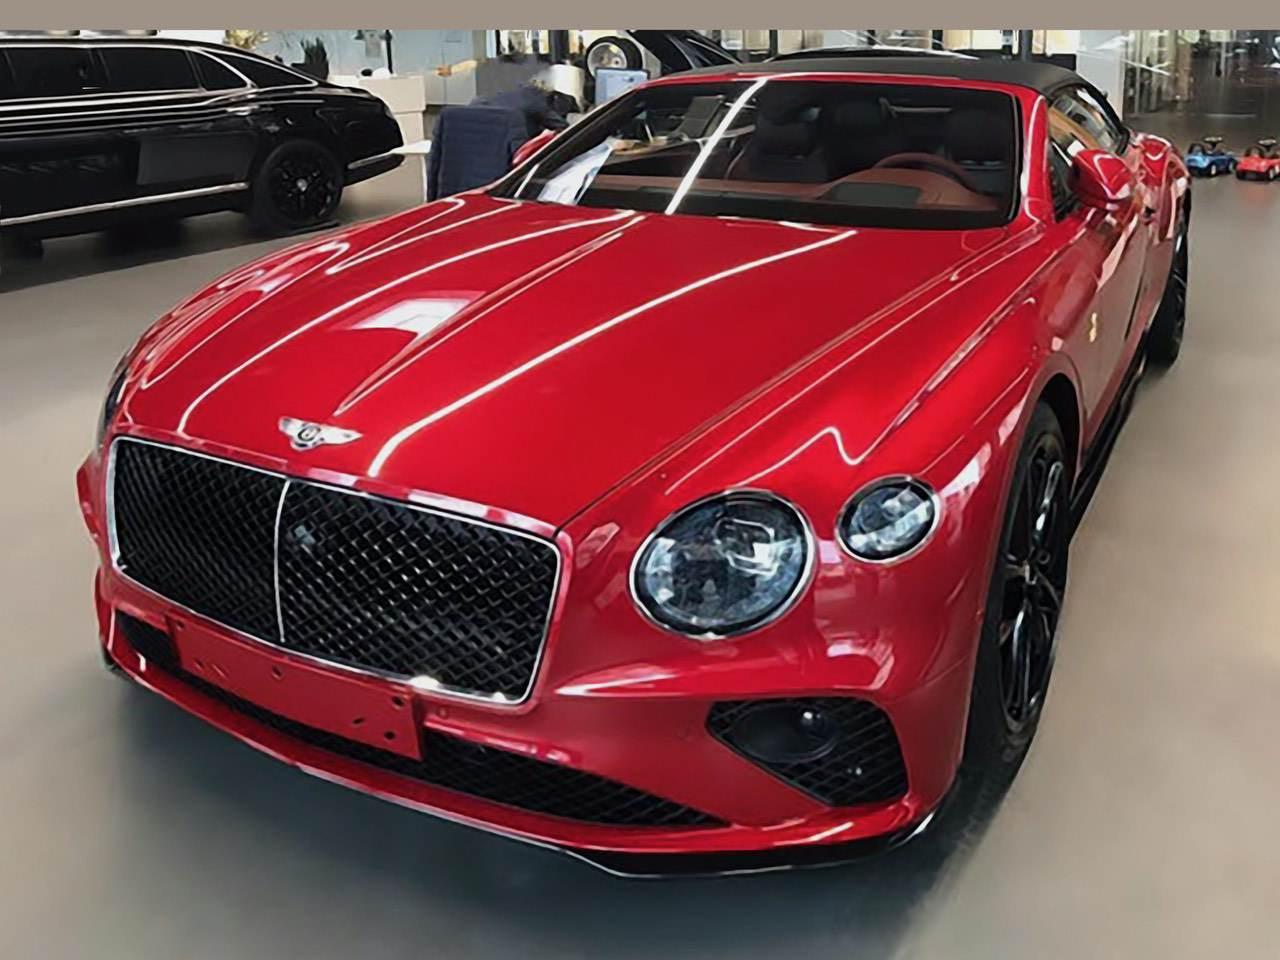 Bentley-Continental-GTC-Dragon-Red-0